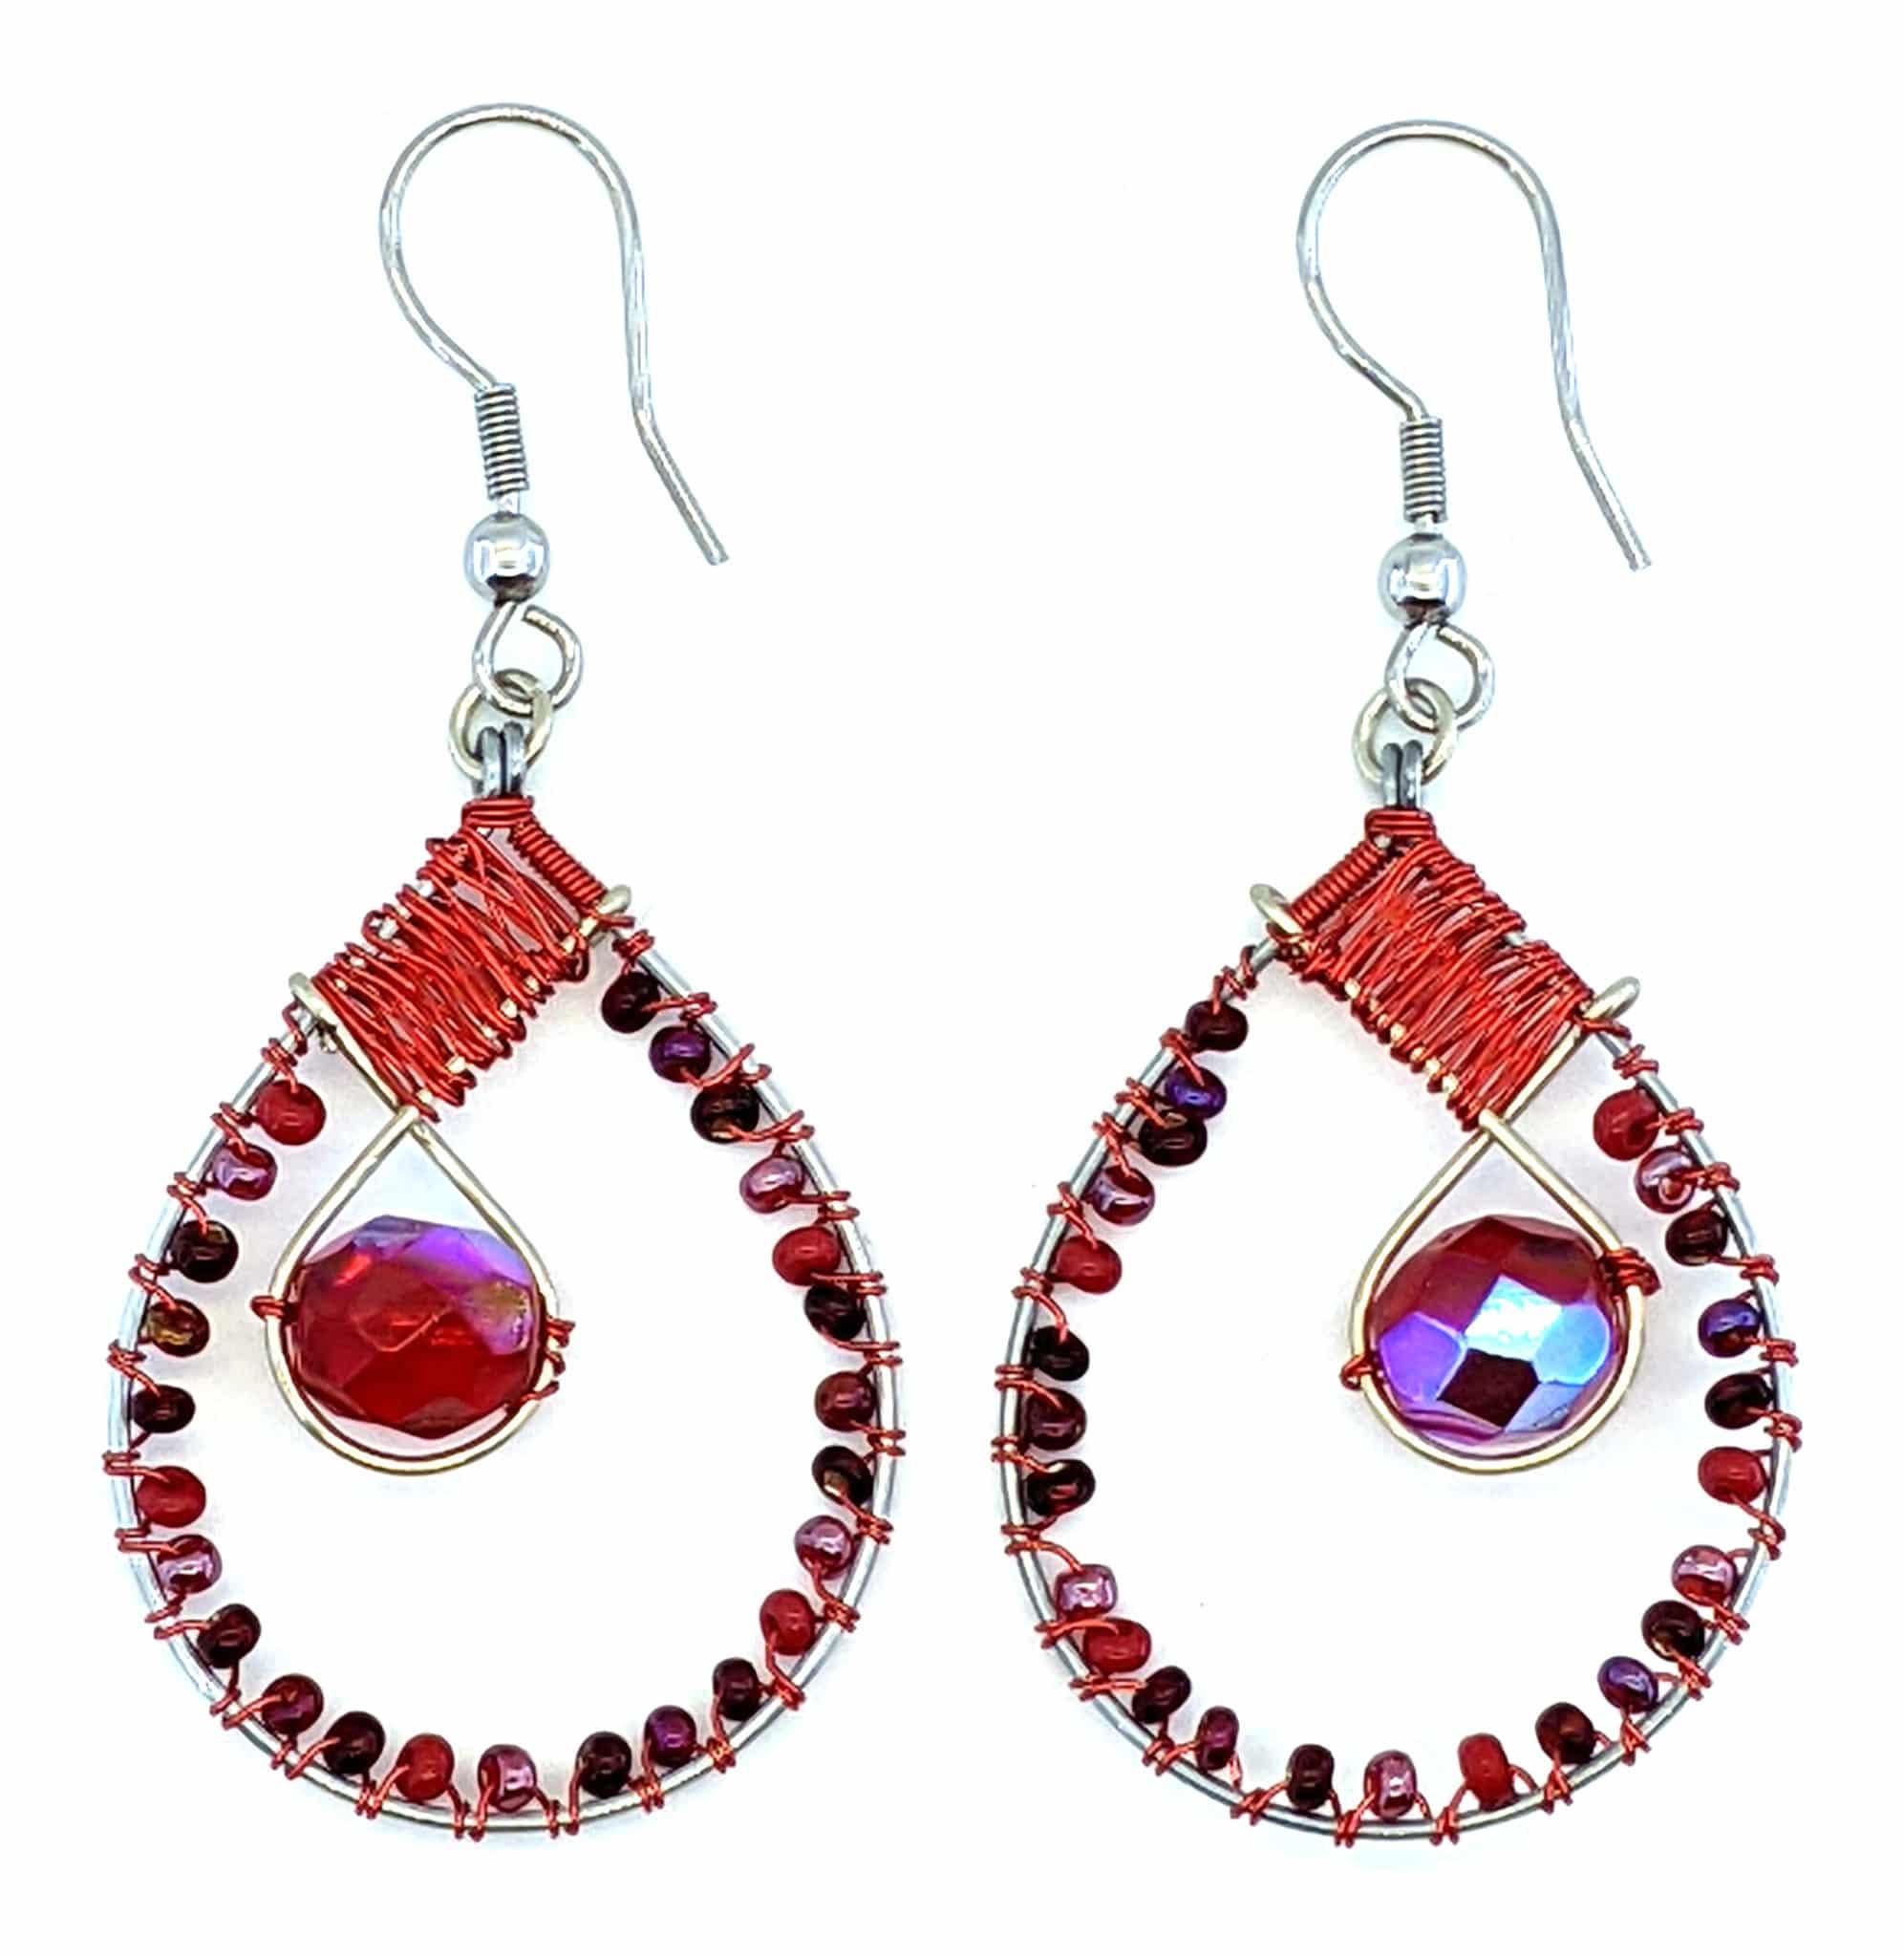 Teardrop with Crystal Beaded Earrings - Reds